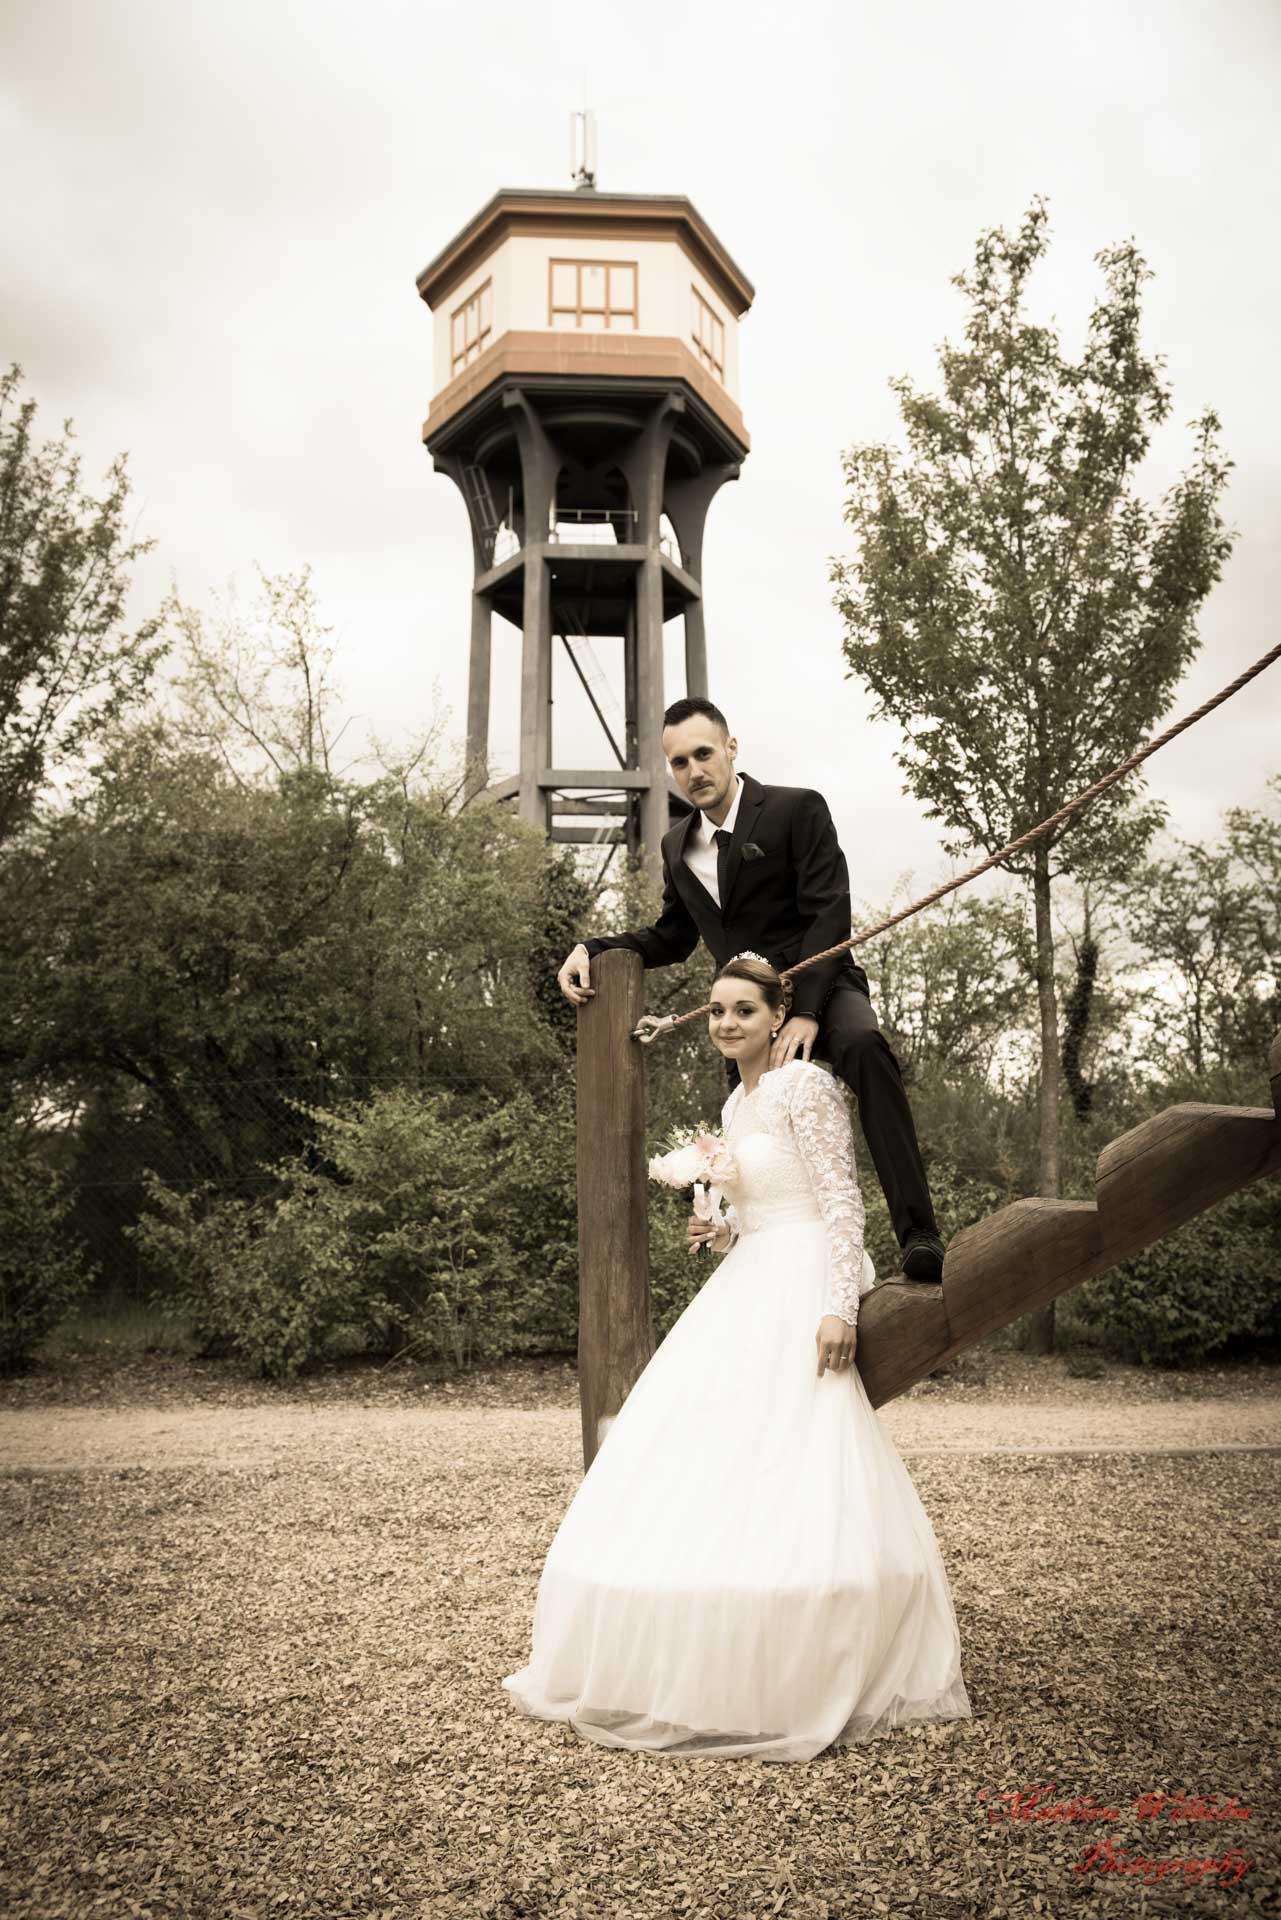 2017-04-15 Adeline Braghiroli - Florian - mariage (368)